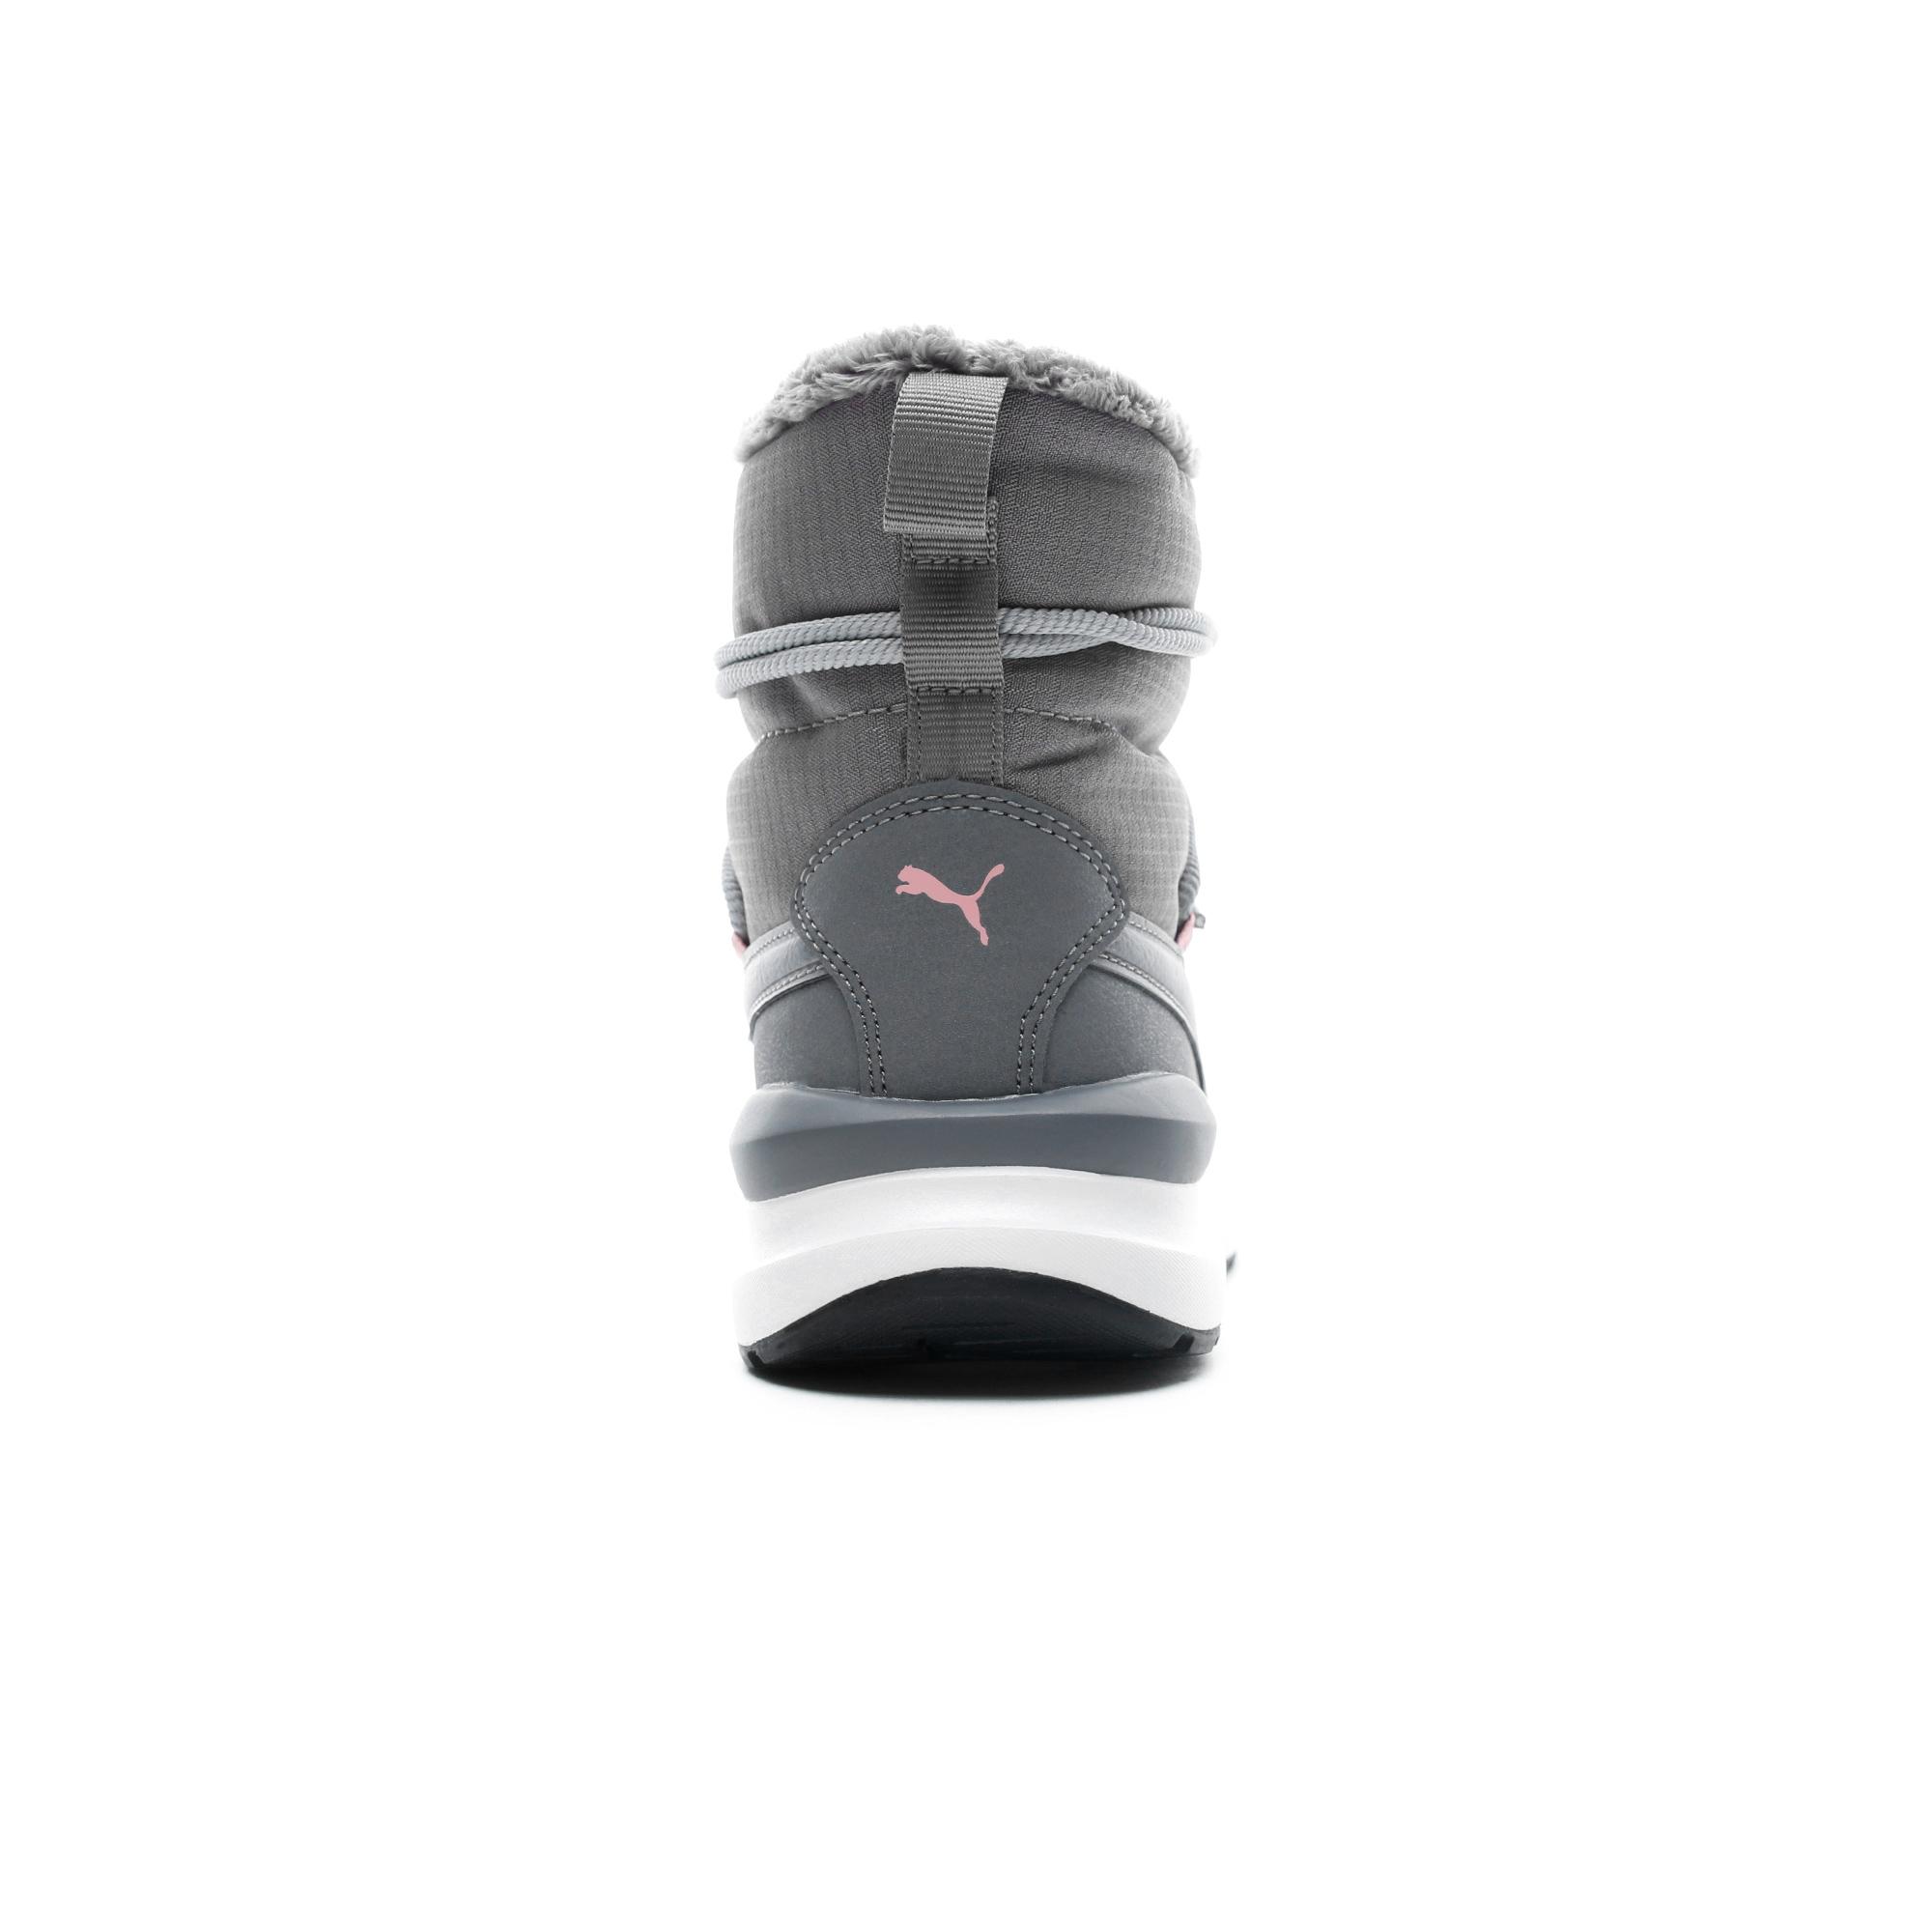 mărci recunoscute oficial aspect nou Puma Adela Winter Boot Kadın Gri Bot Kadin Bot & Çizme 3471123 ...